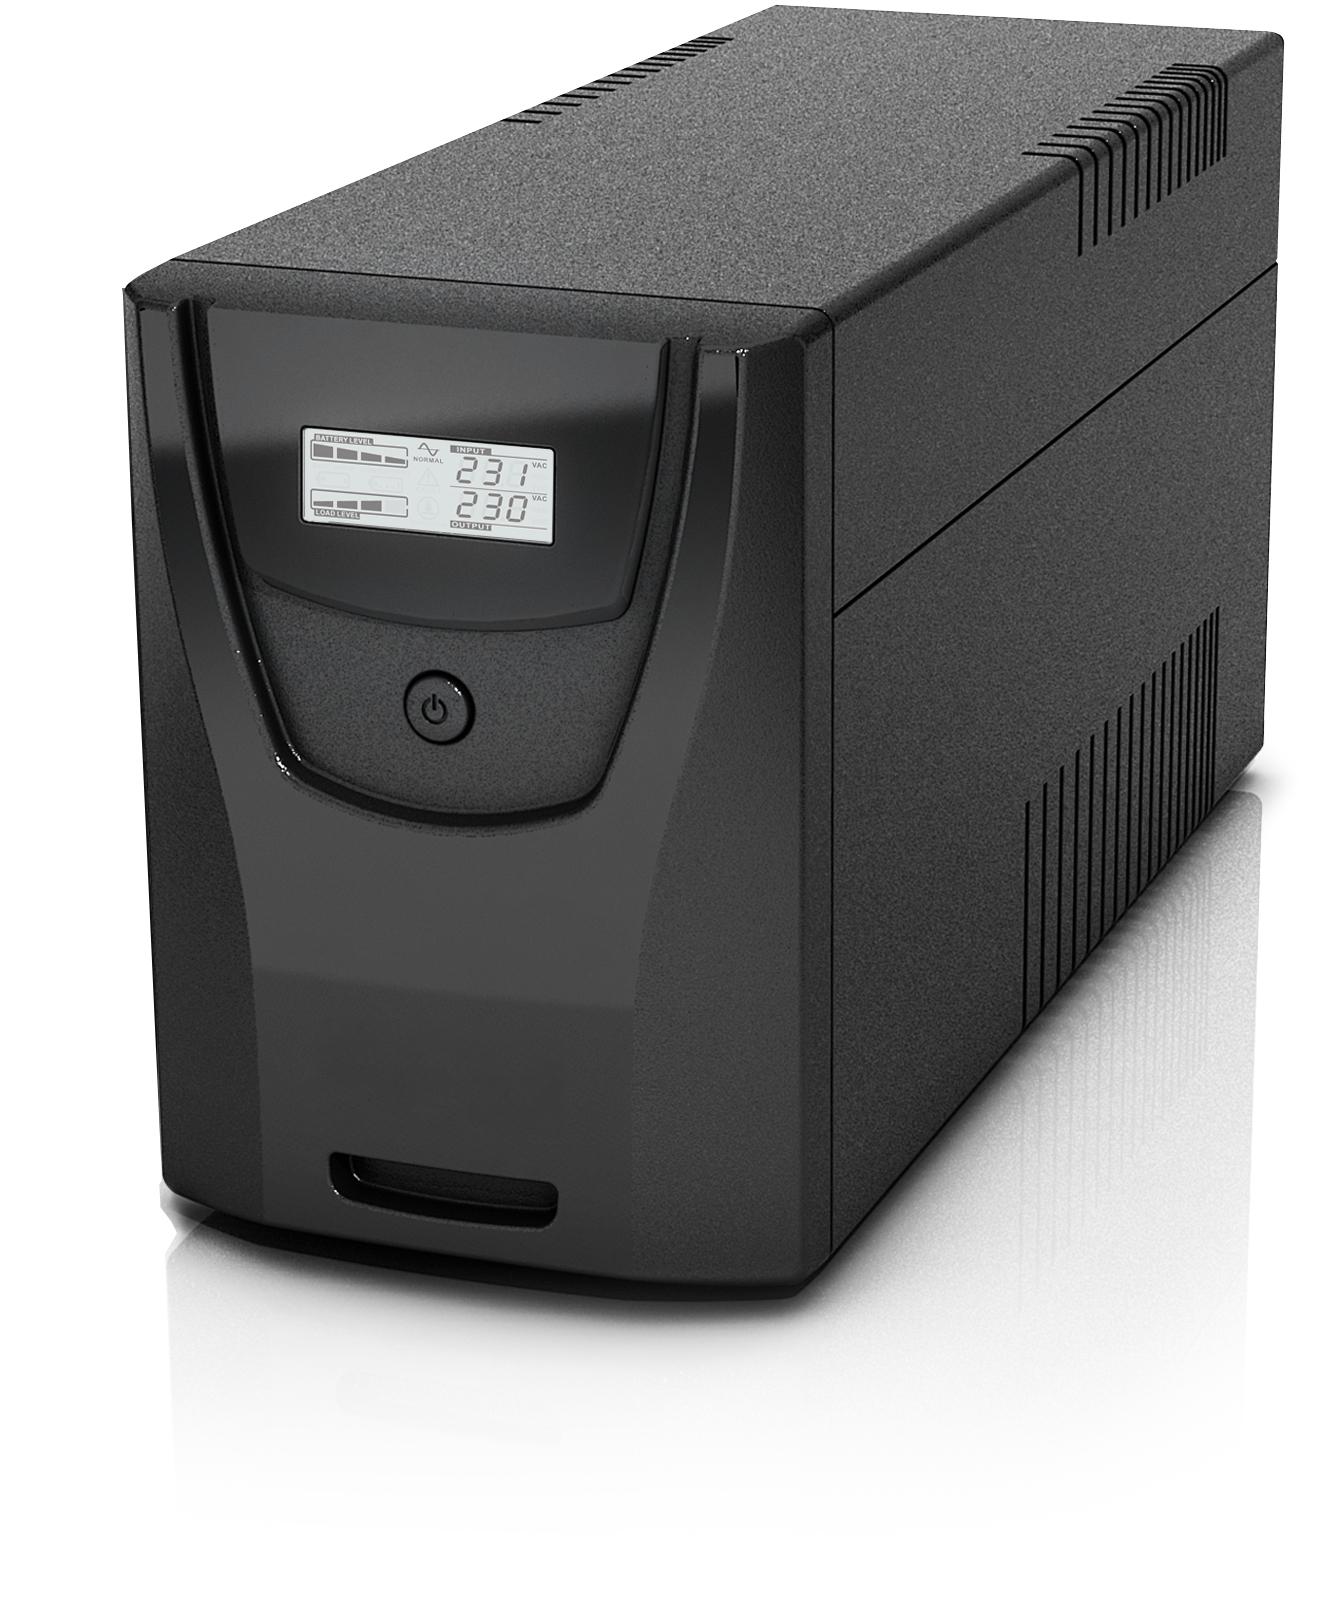 1 Stk USV GENIO Net Power 1000VA 600W 5 Min. 1ph/1ph / Line-int. USNPW100--